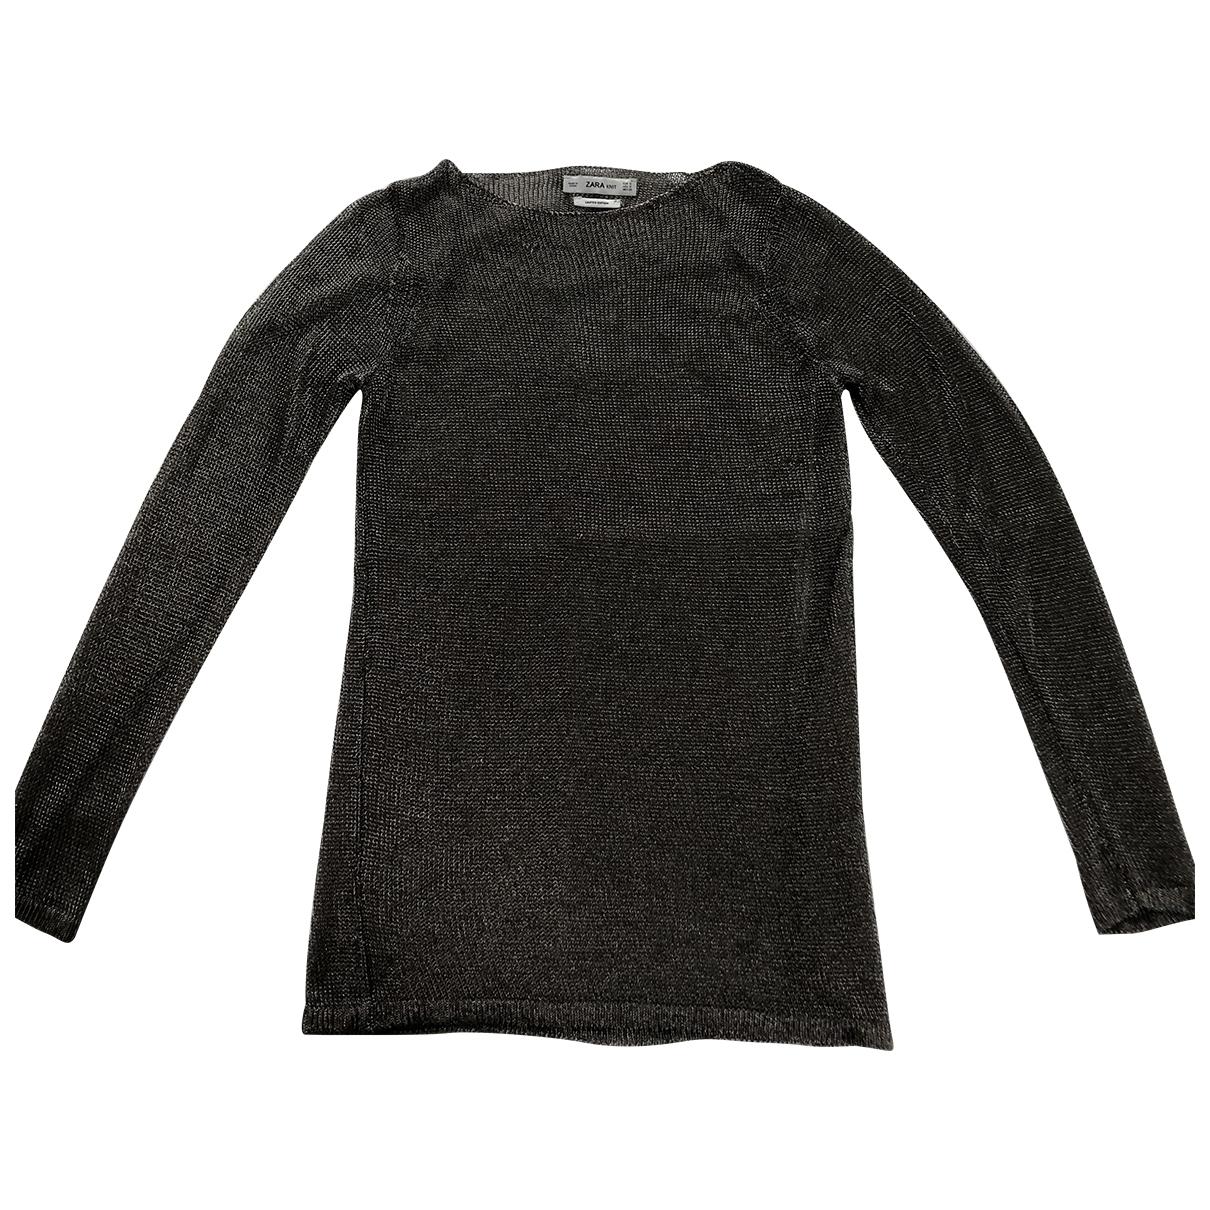 Zara - Top   pour femme - metallise